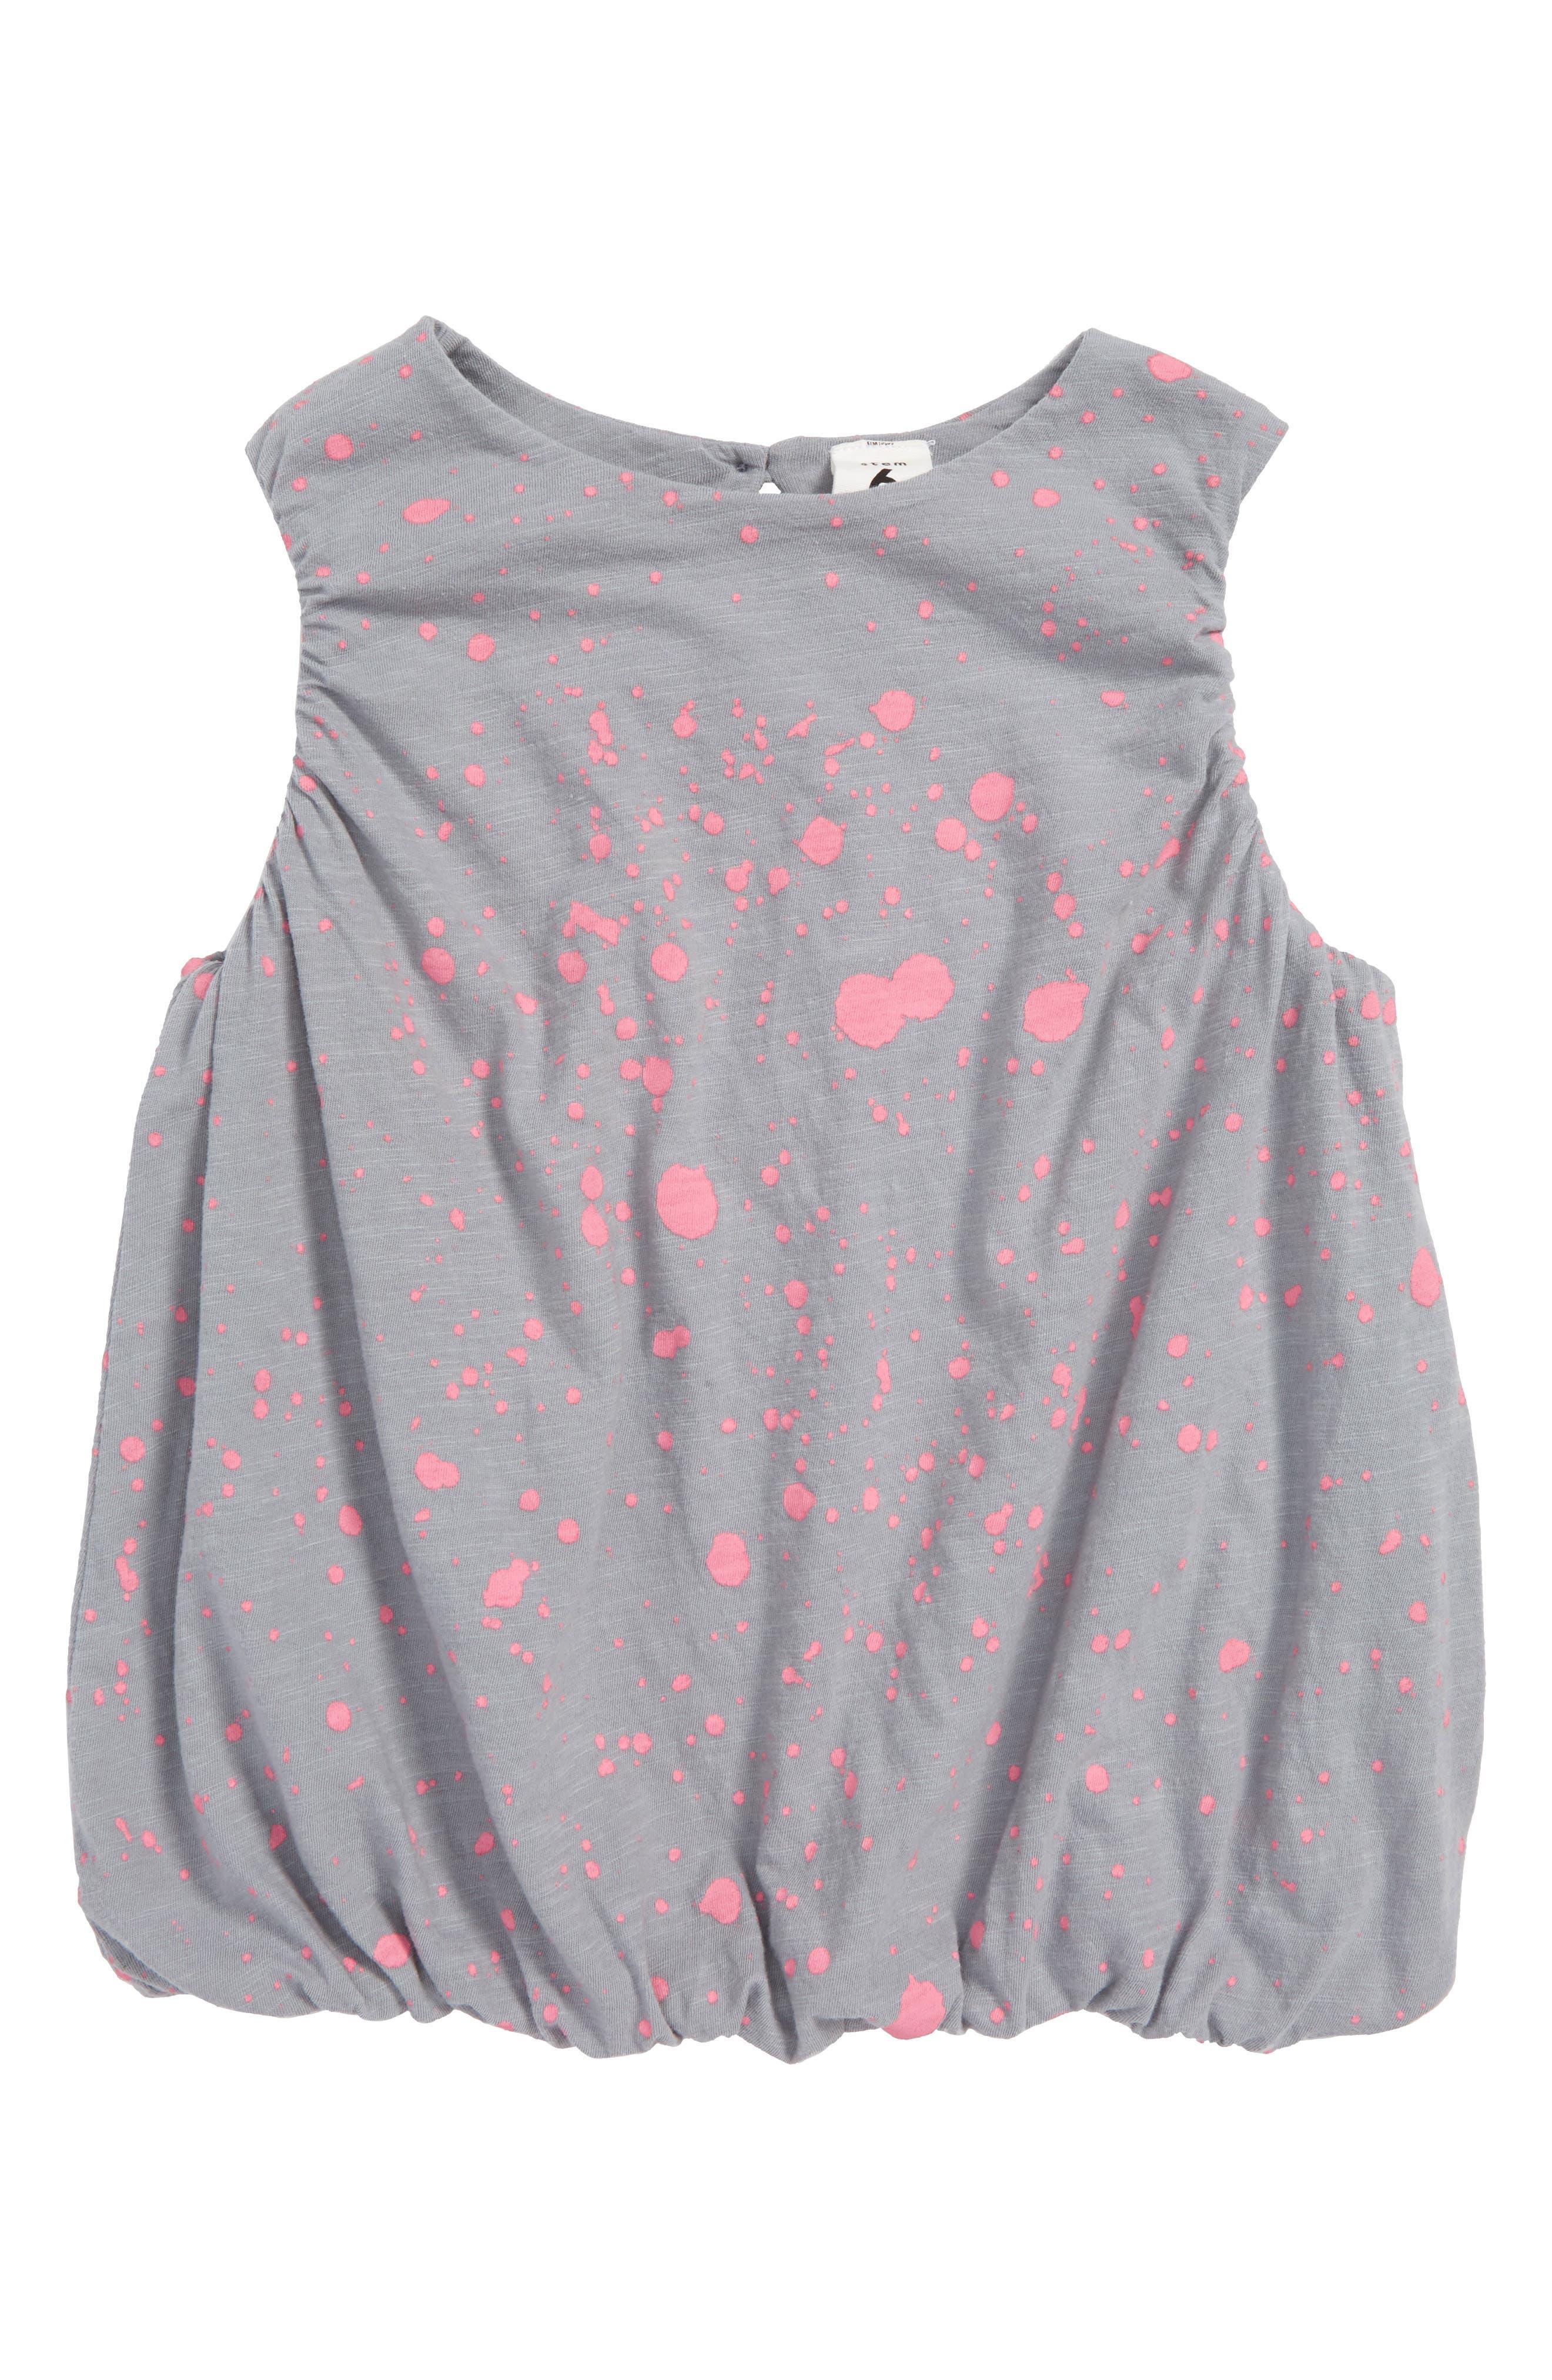 Print Bubble Tank,                         Main,                         color, Grey Sleet- Pink Splatter